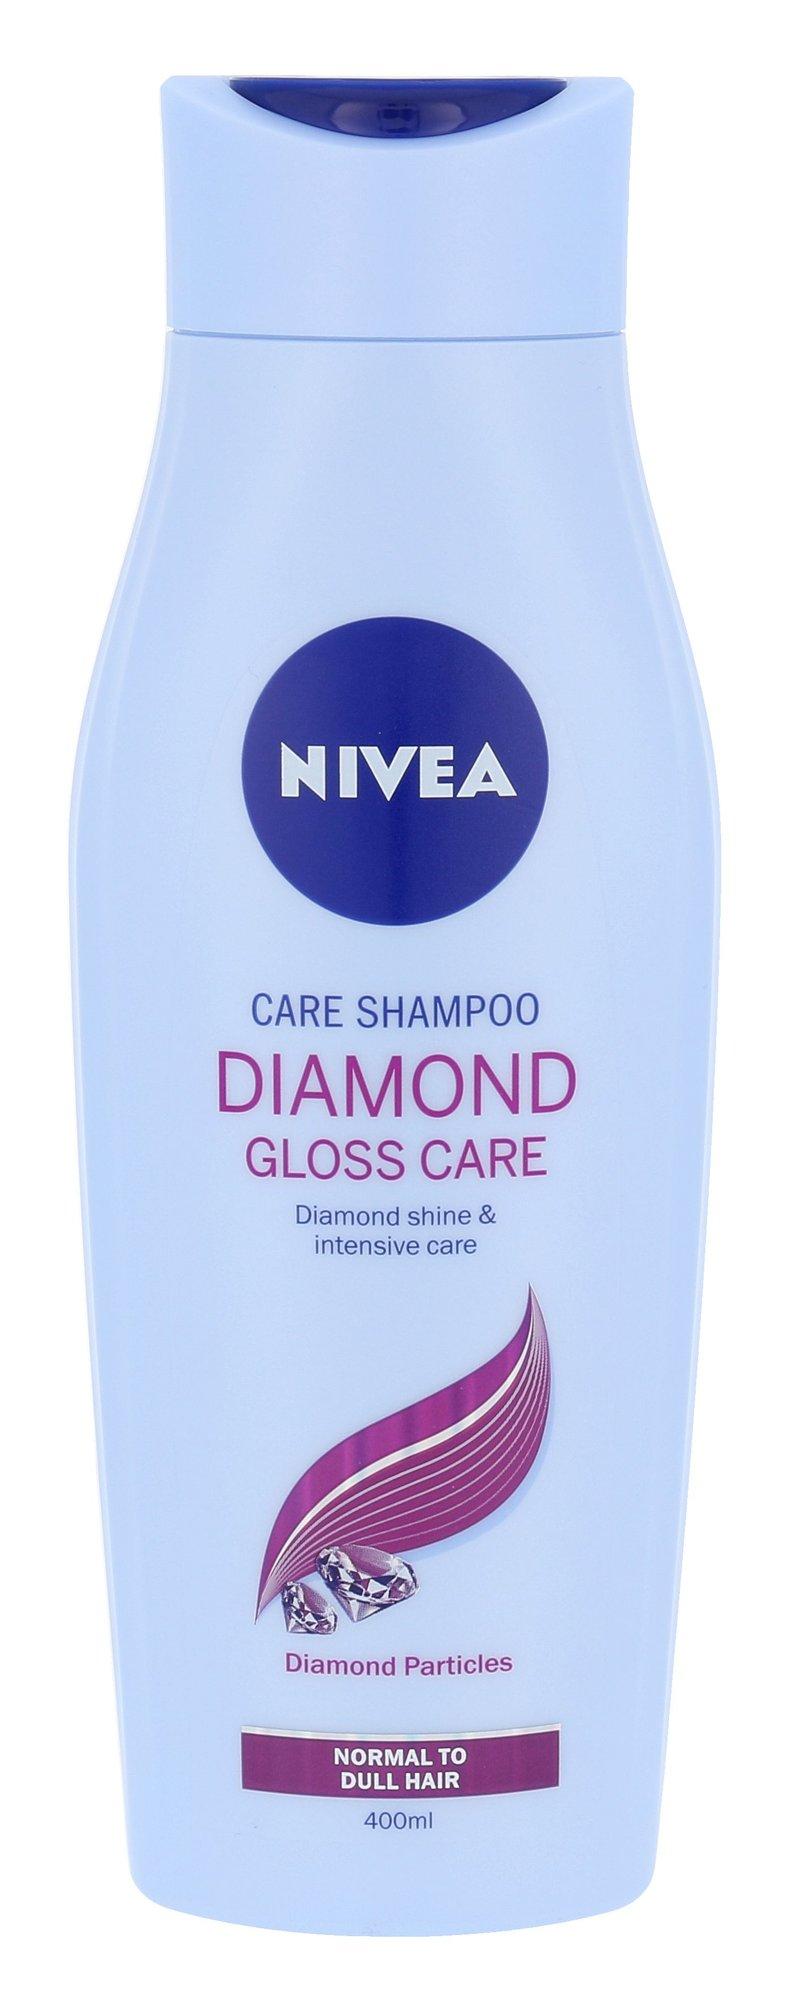 Nivea Diamond Gloss Care Cosmetic 400ml